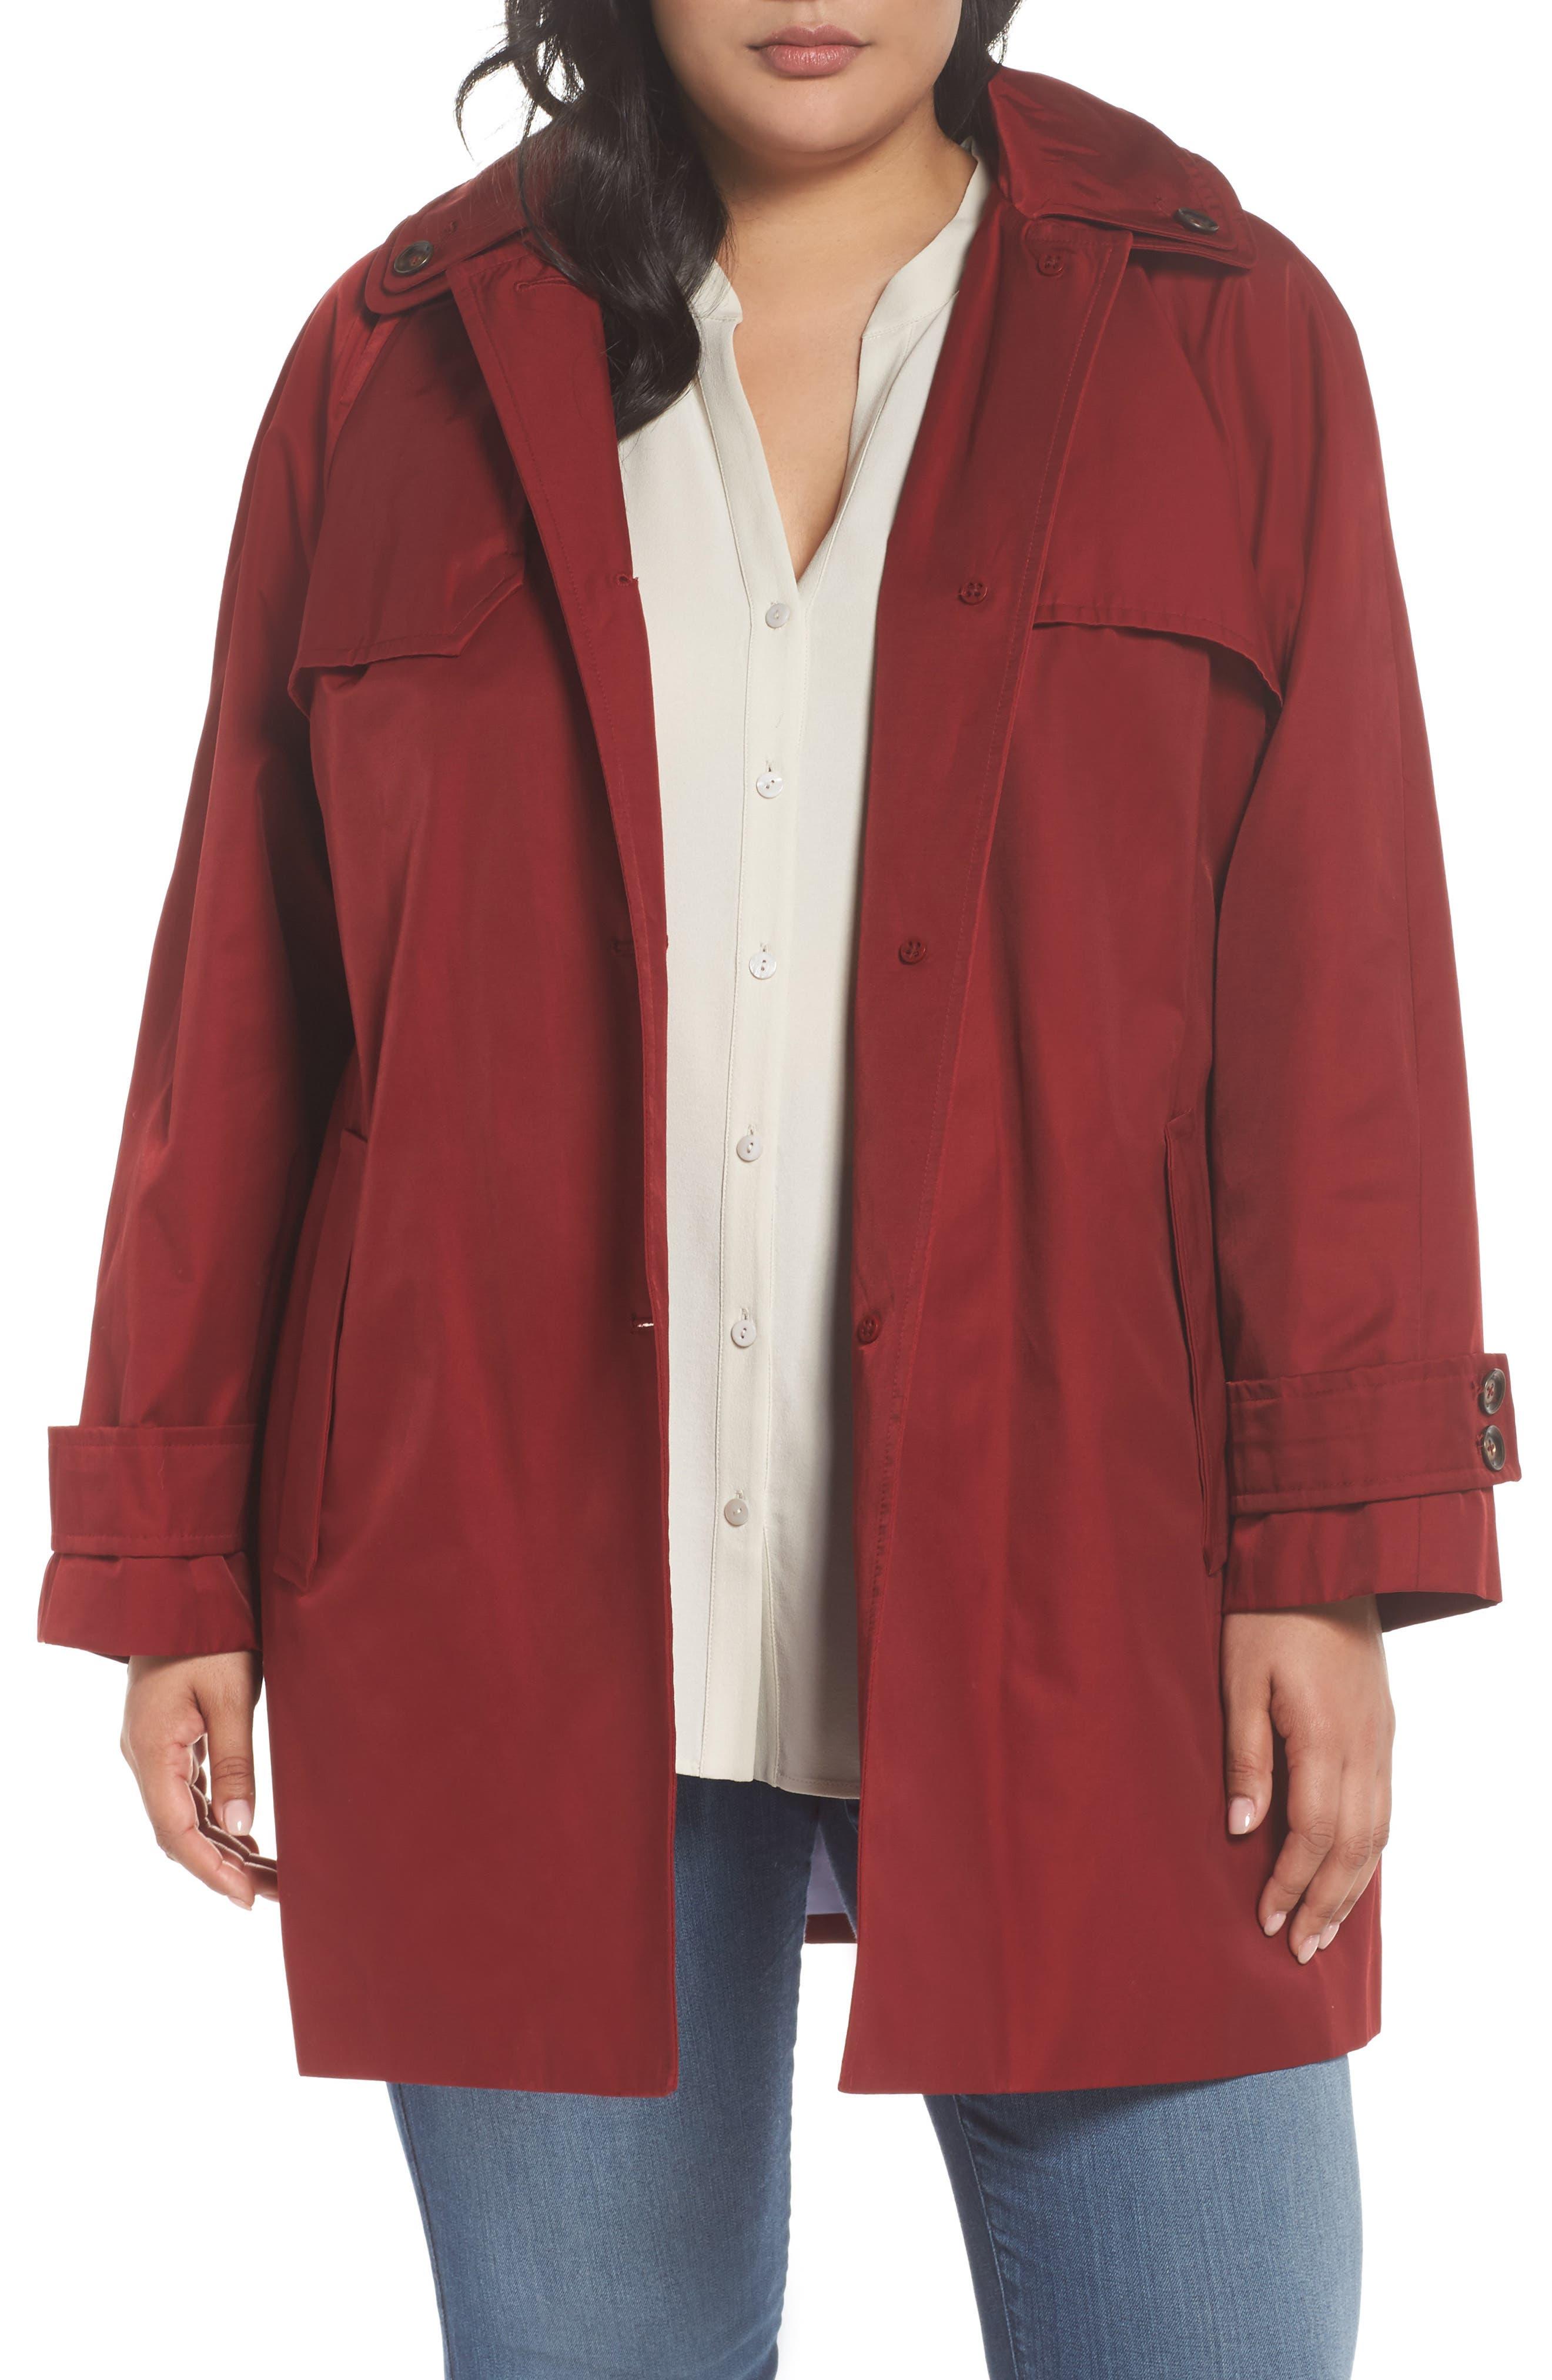 Removable Hood Rain Jacket,                             Main thumbnail 1, color,                             Red